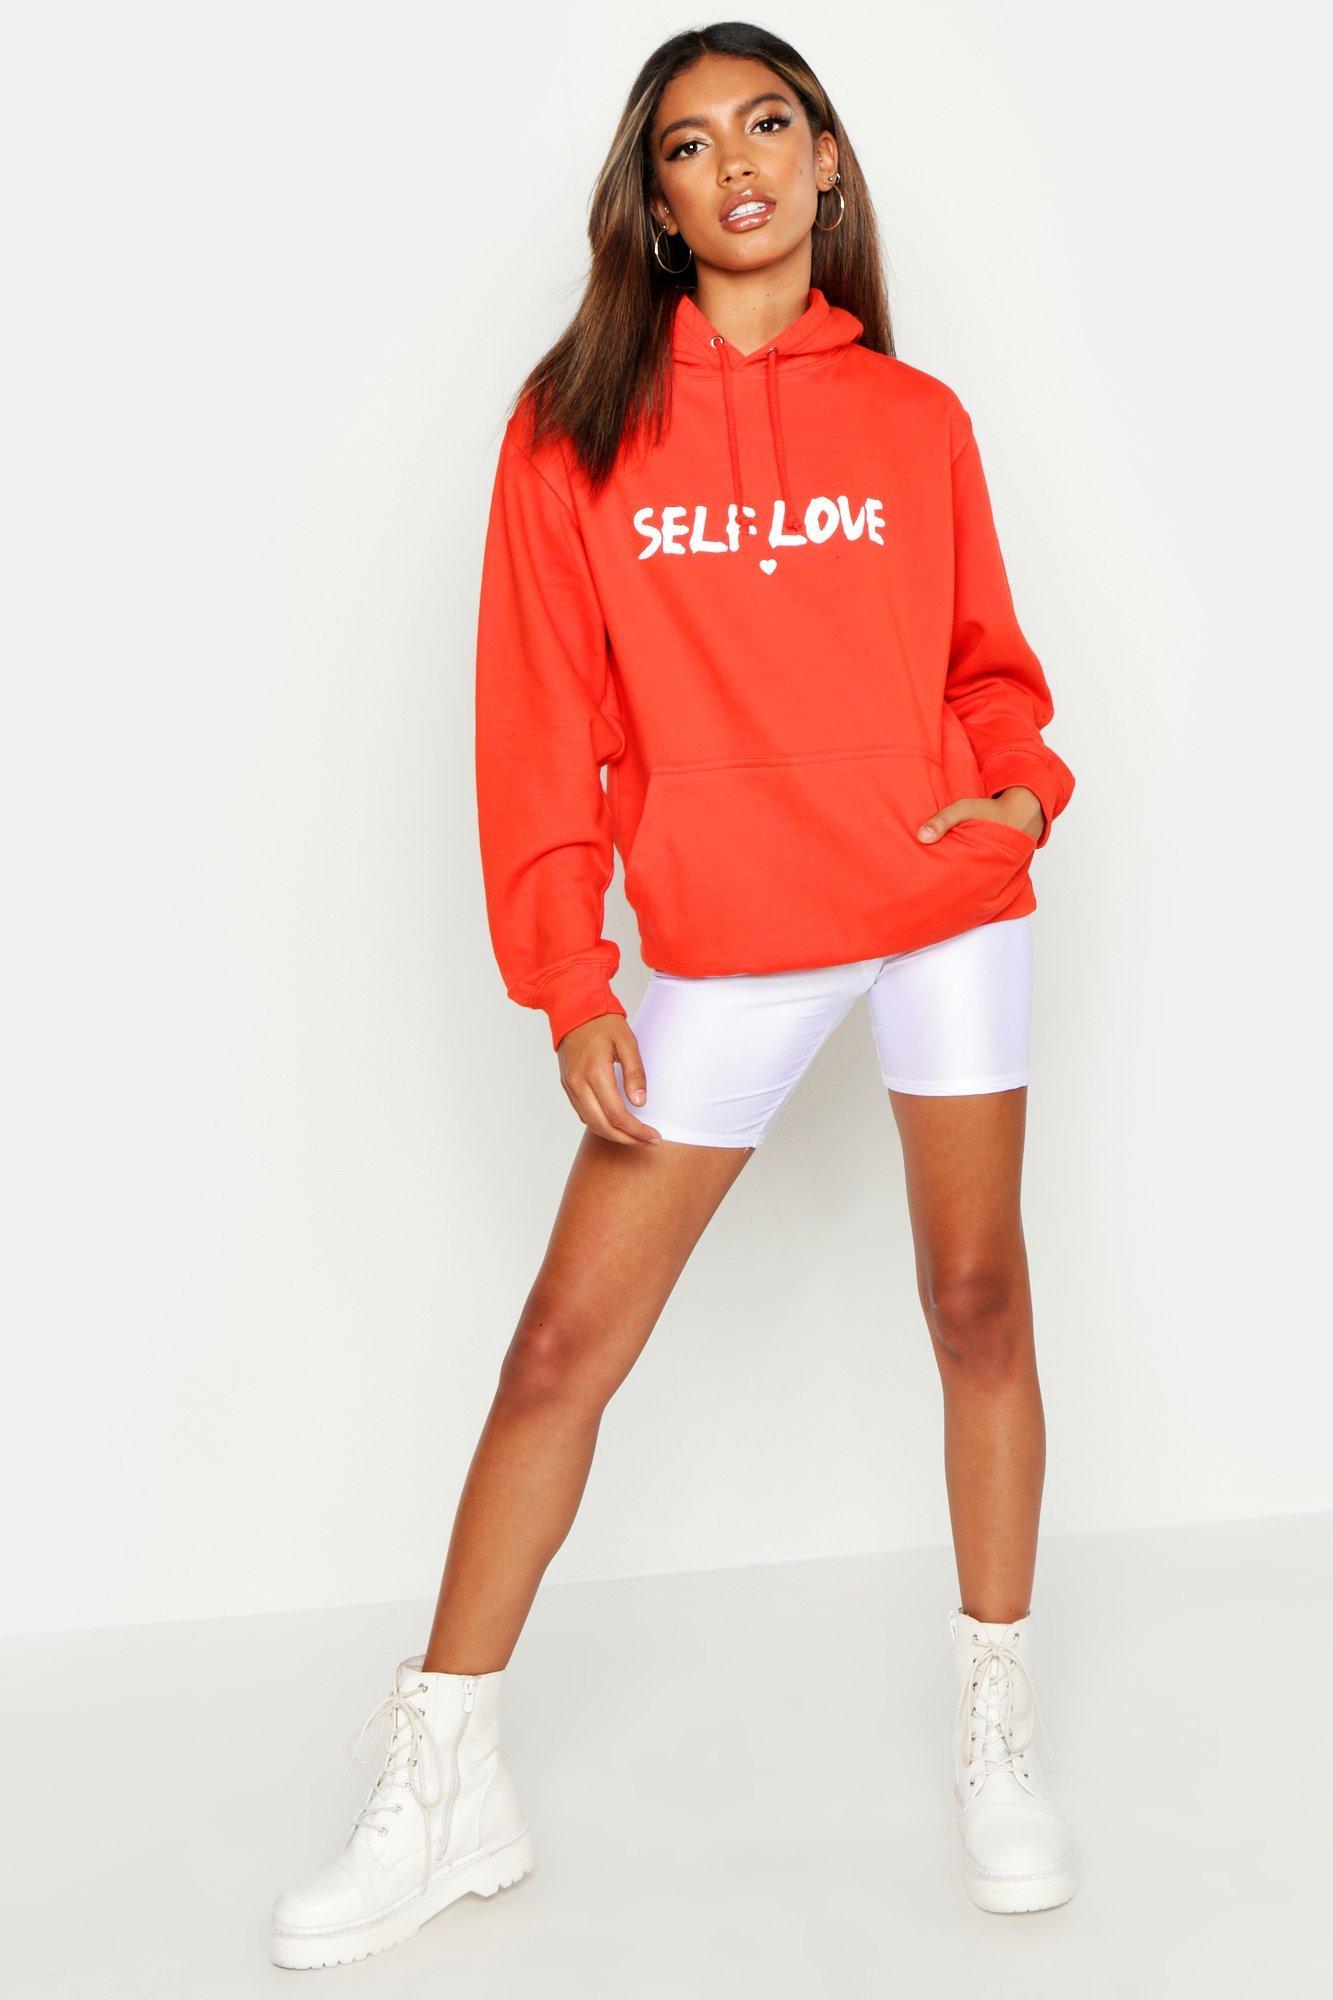 "Womens Hoodie mit Slogan ""Self Love"" - orange - S, Orange - Boohoo.com"